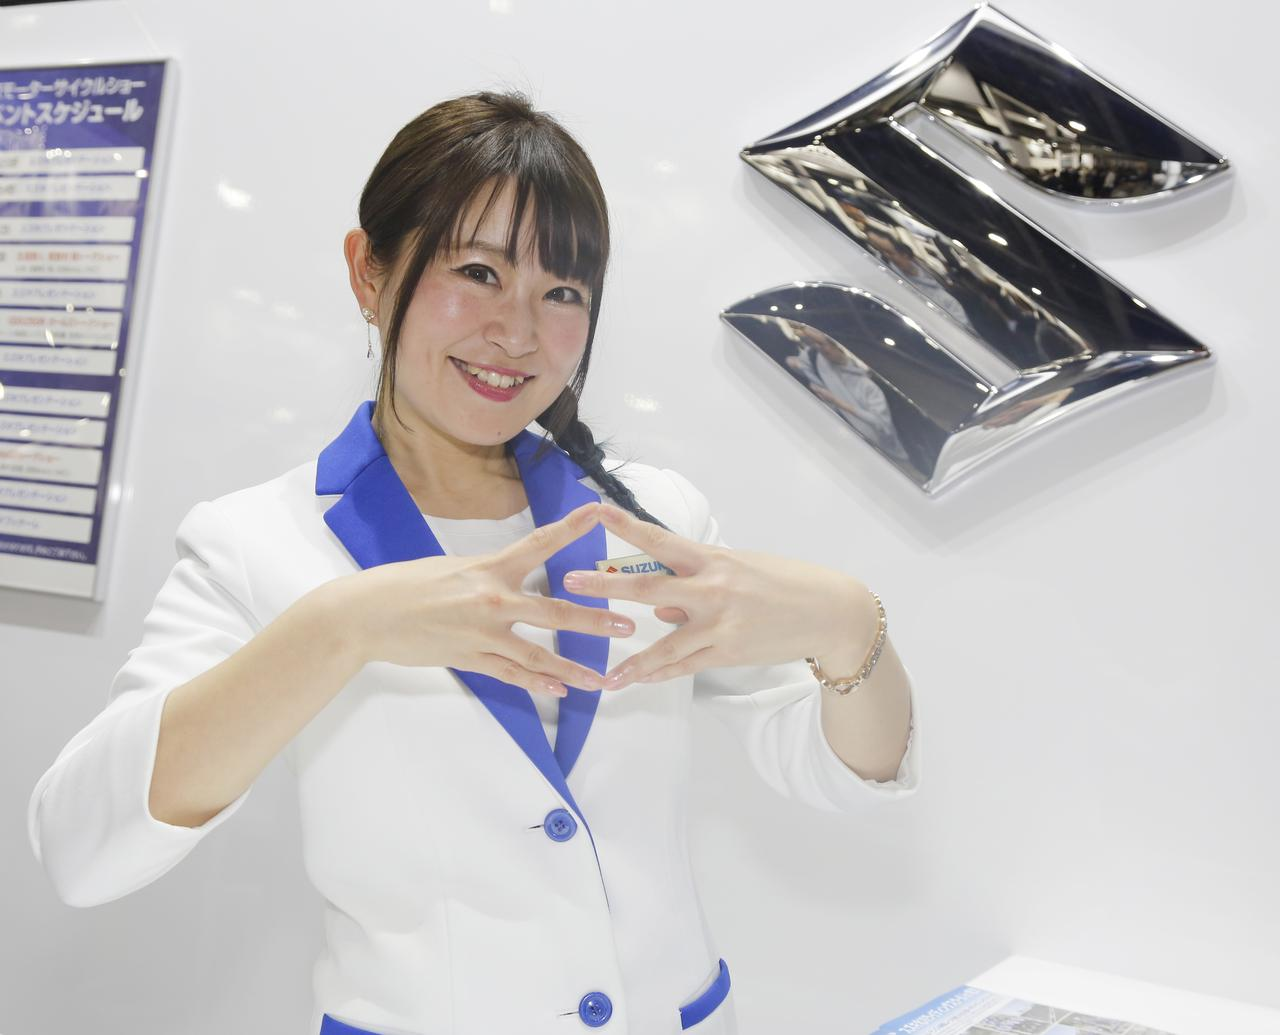 Images : 2番目の画像 - TMCS2019 美女コンパニオン図鑑! - webオートバイ